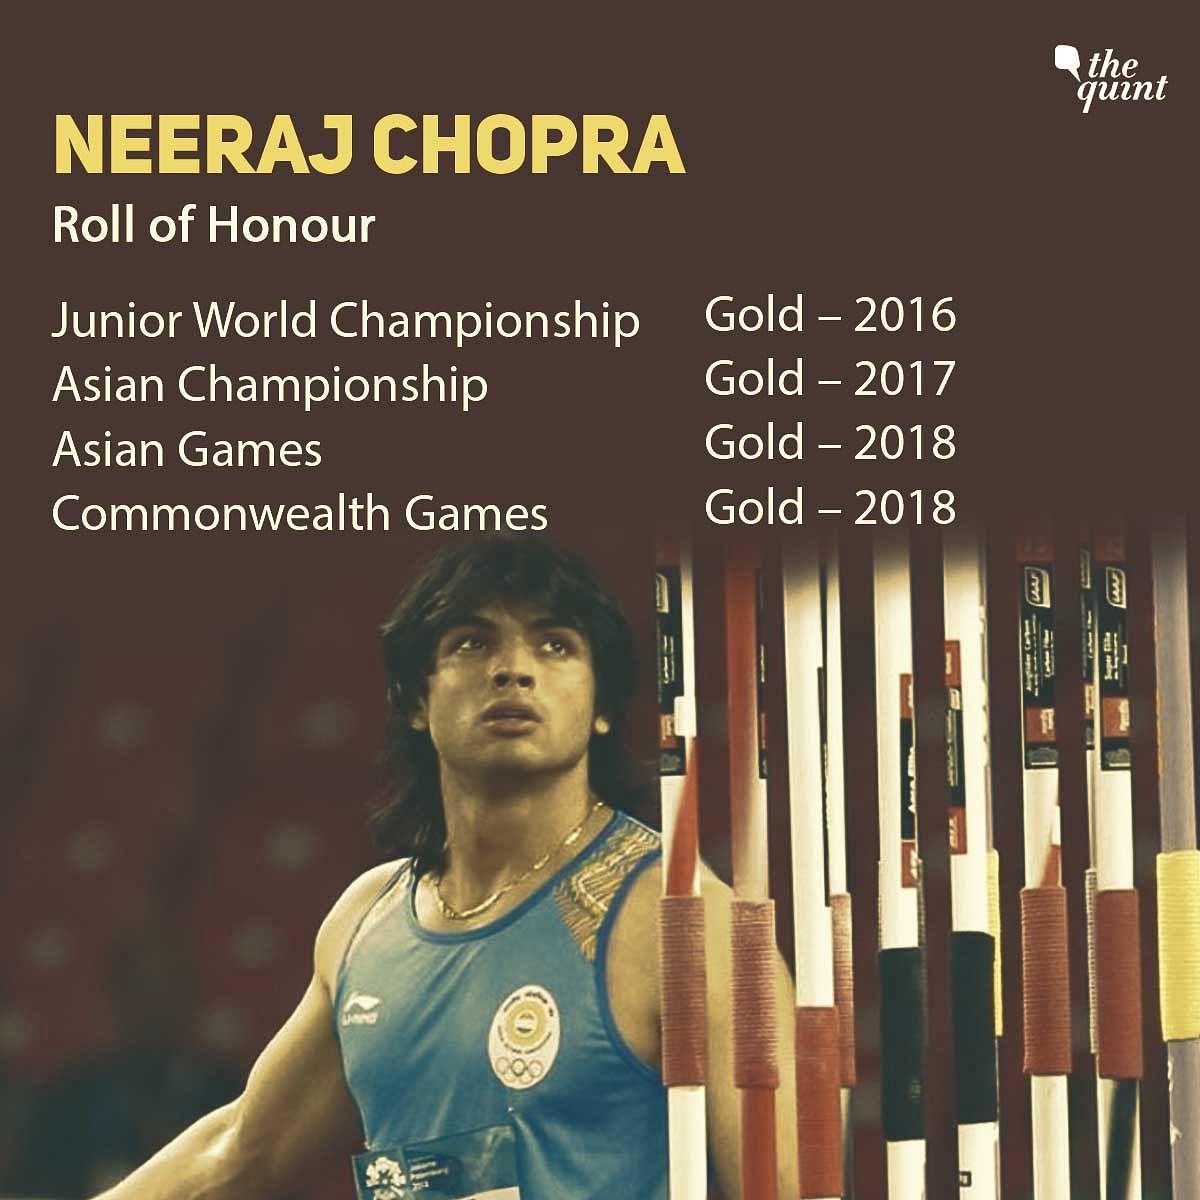 Consistency Key as Neeraj Chopra Aims for Stars at 2020 Tokyo Olympics